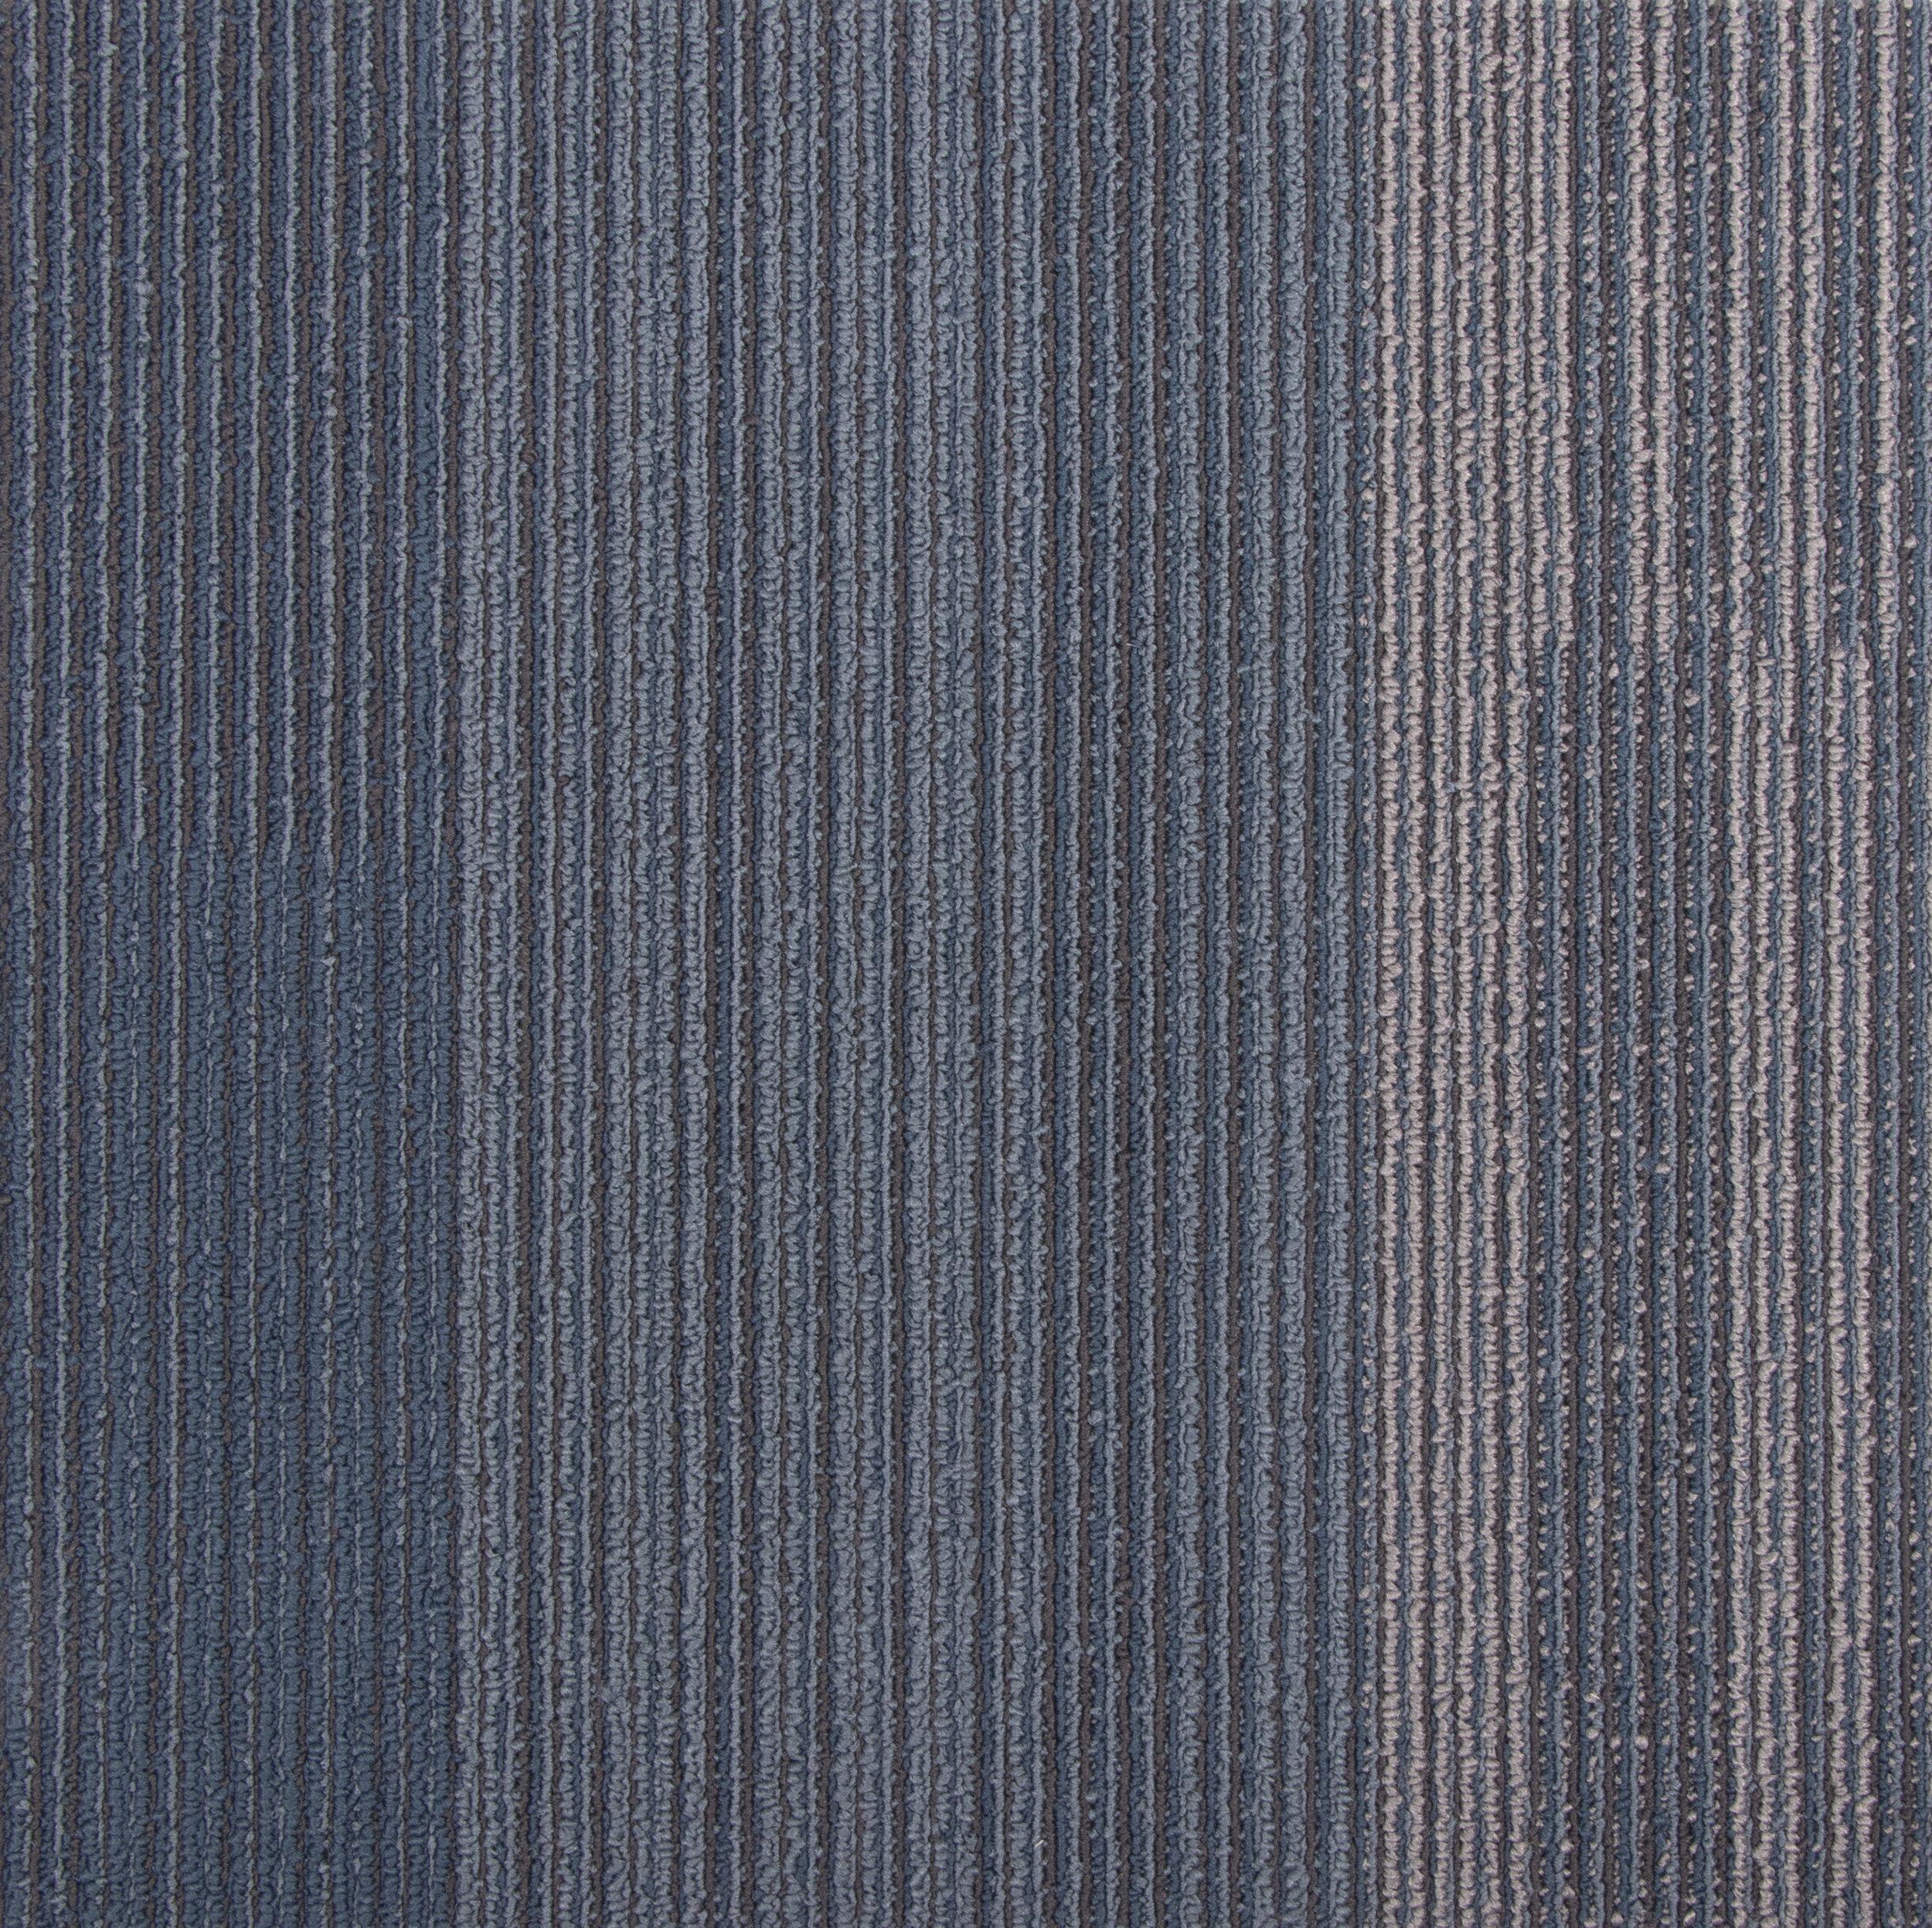 PRUSSIAN BLUE — 60072